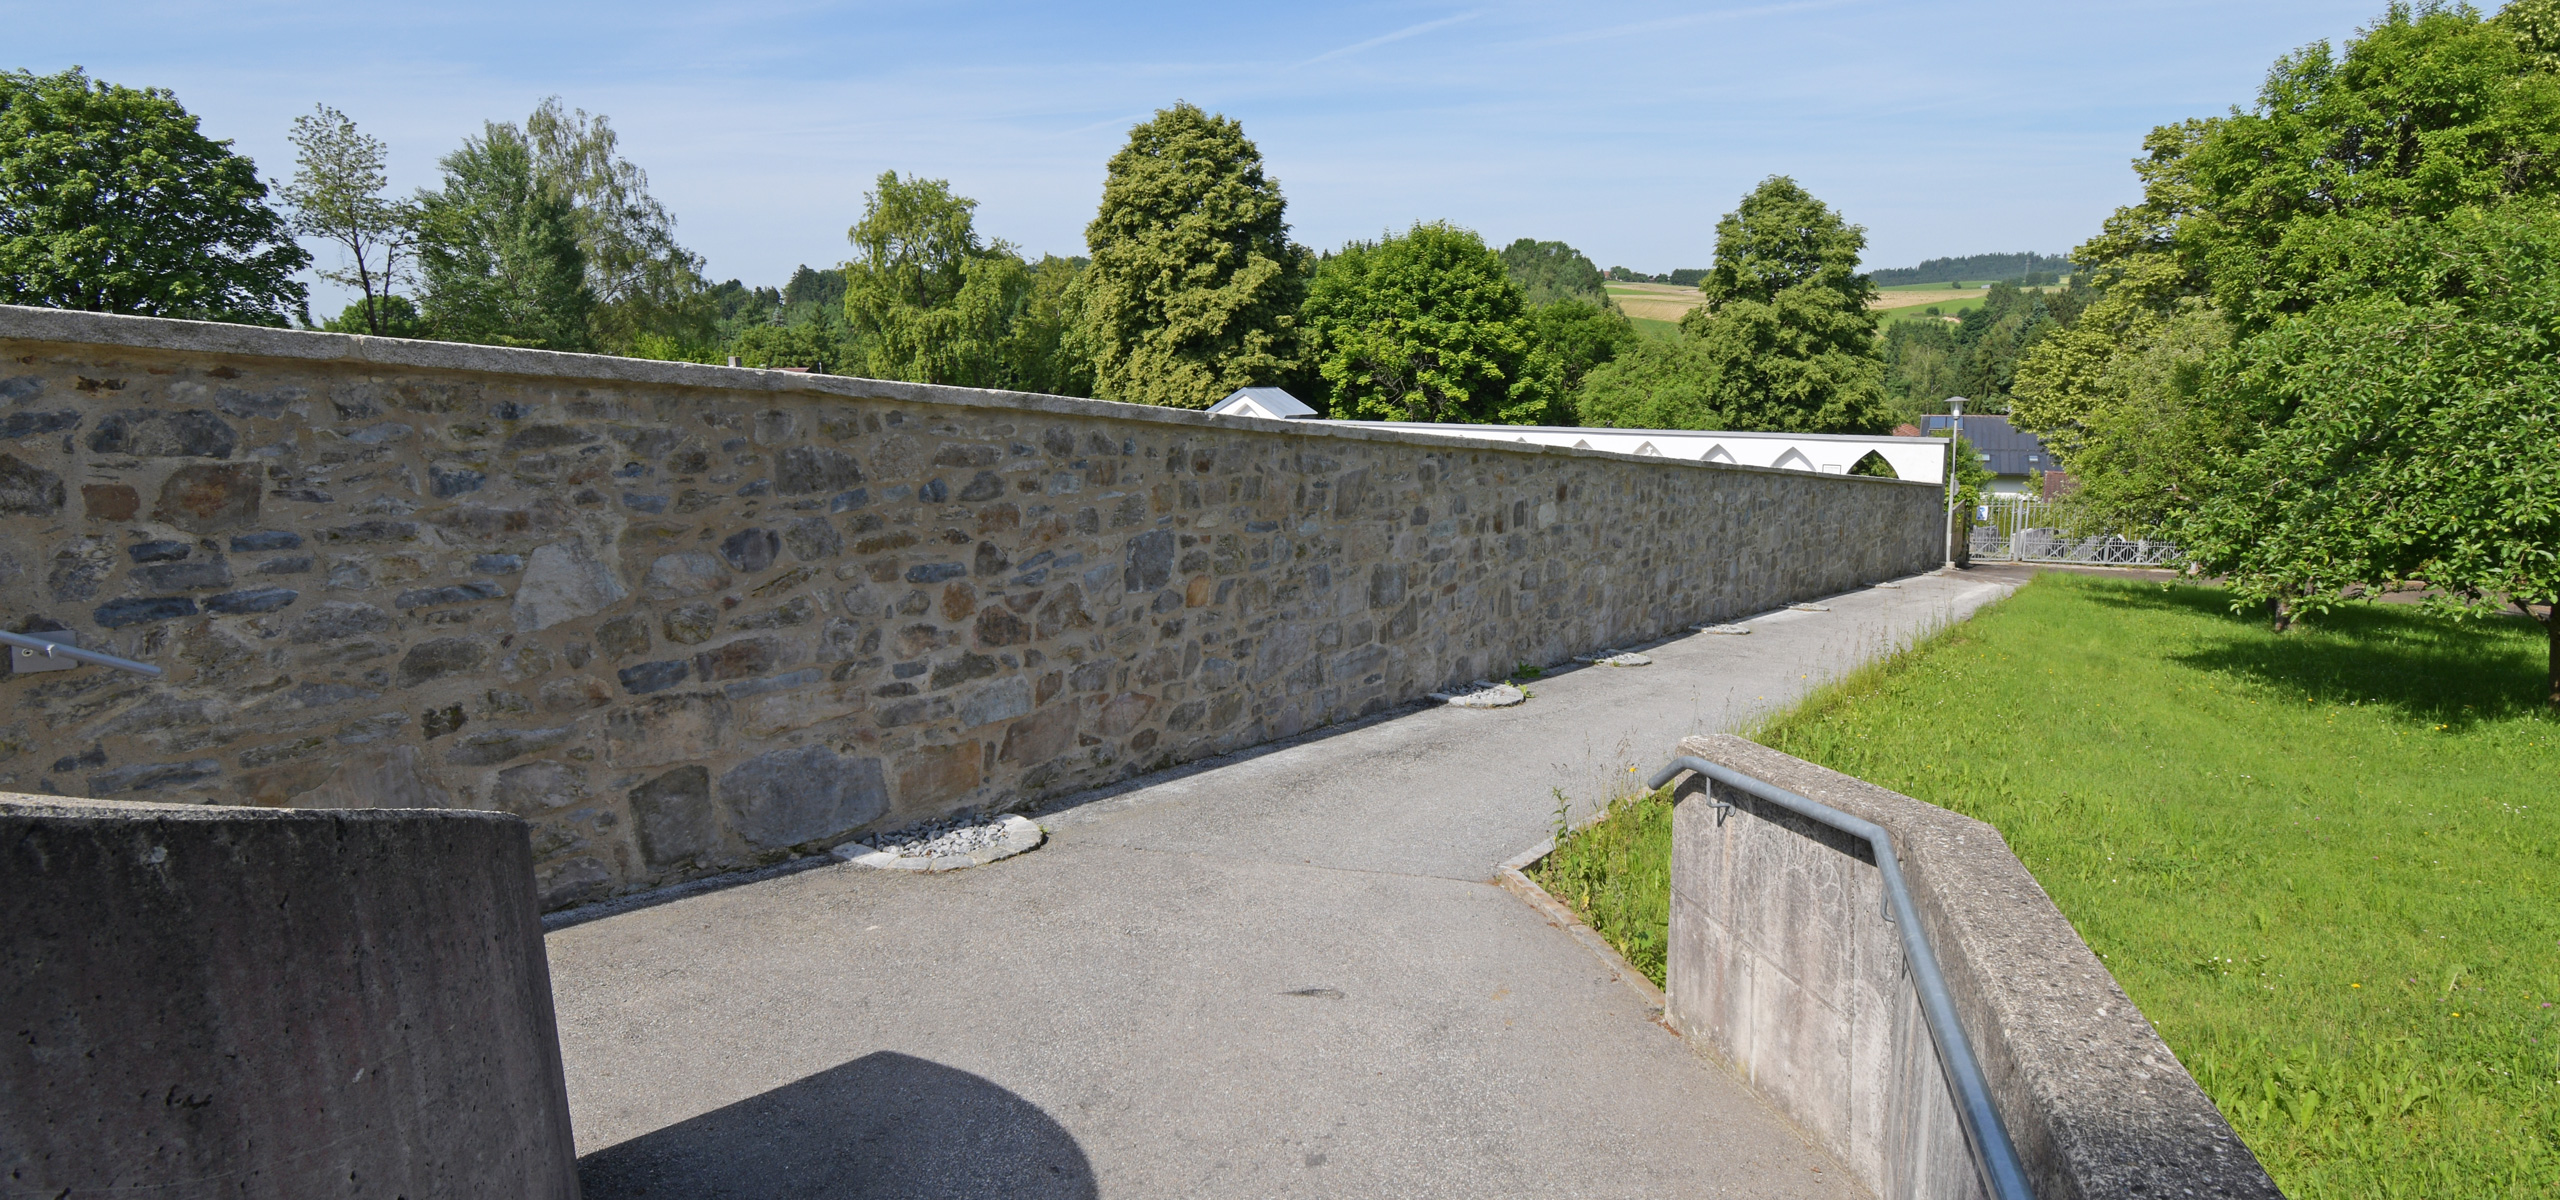 Projekt 03_Instandsetzung historische Mauer